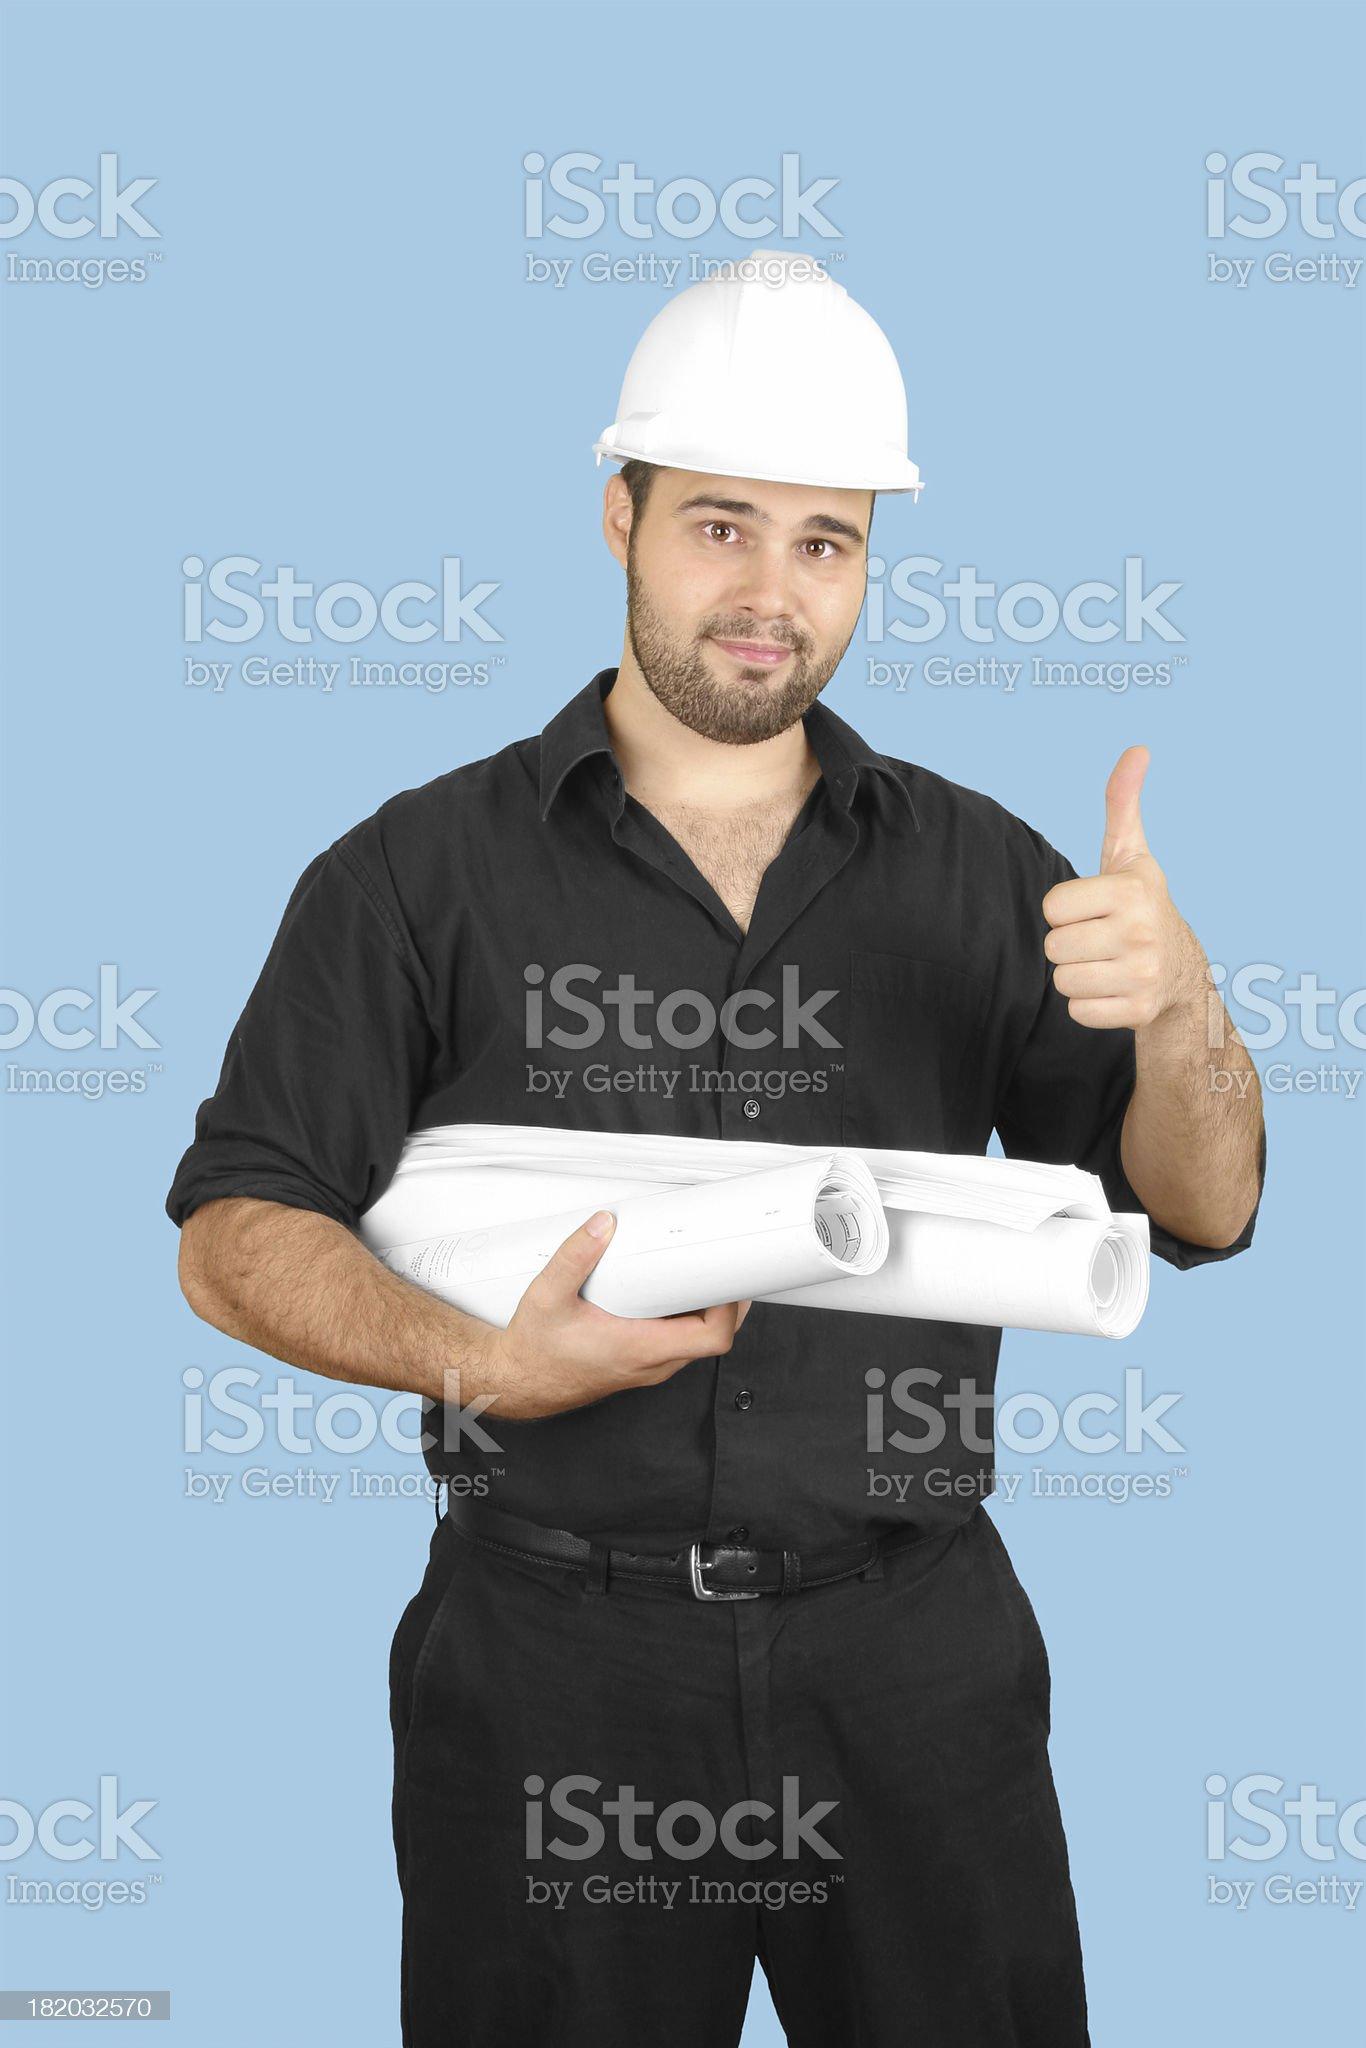 Engineer - OK royalty-free stock photo